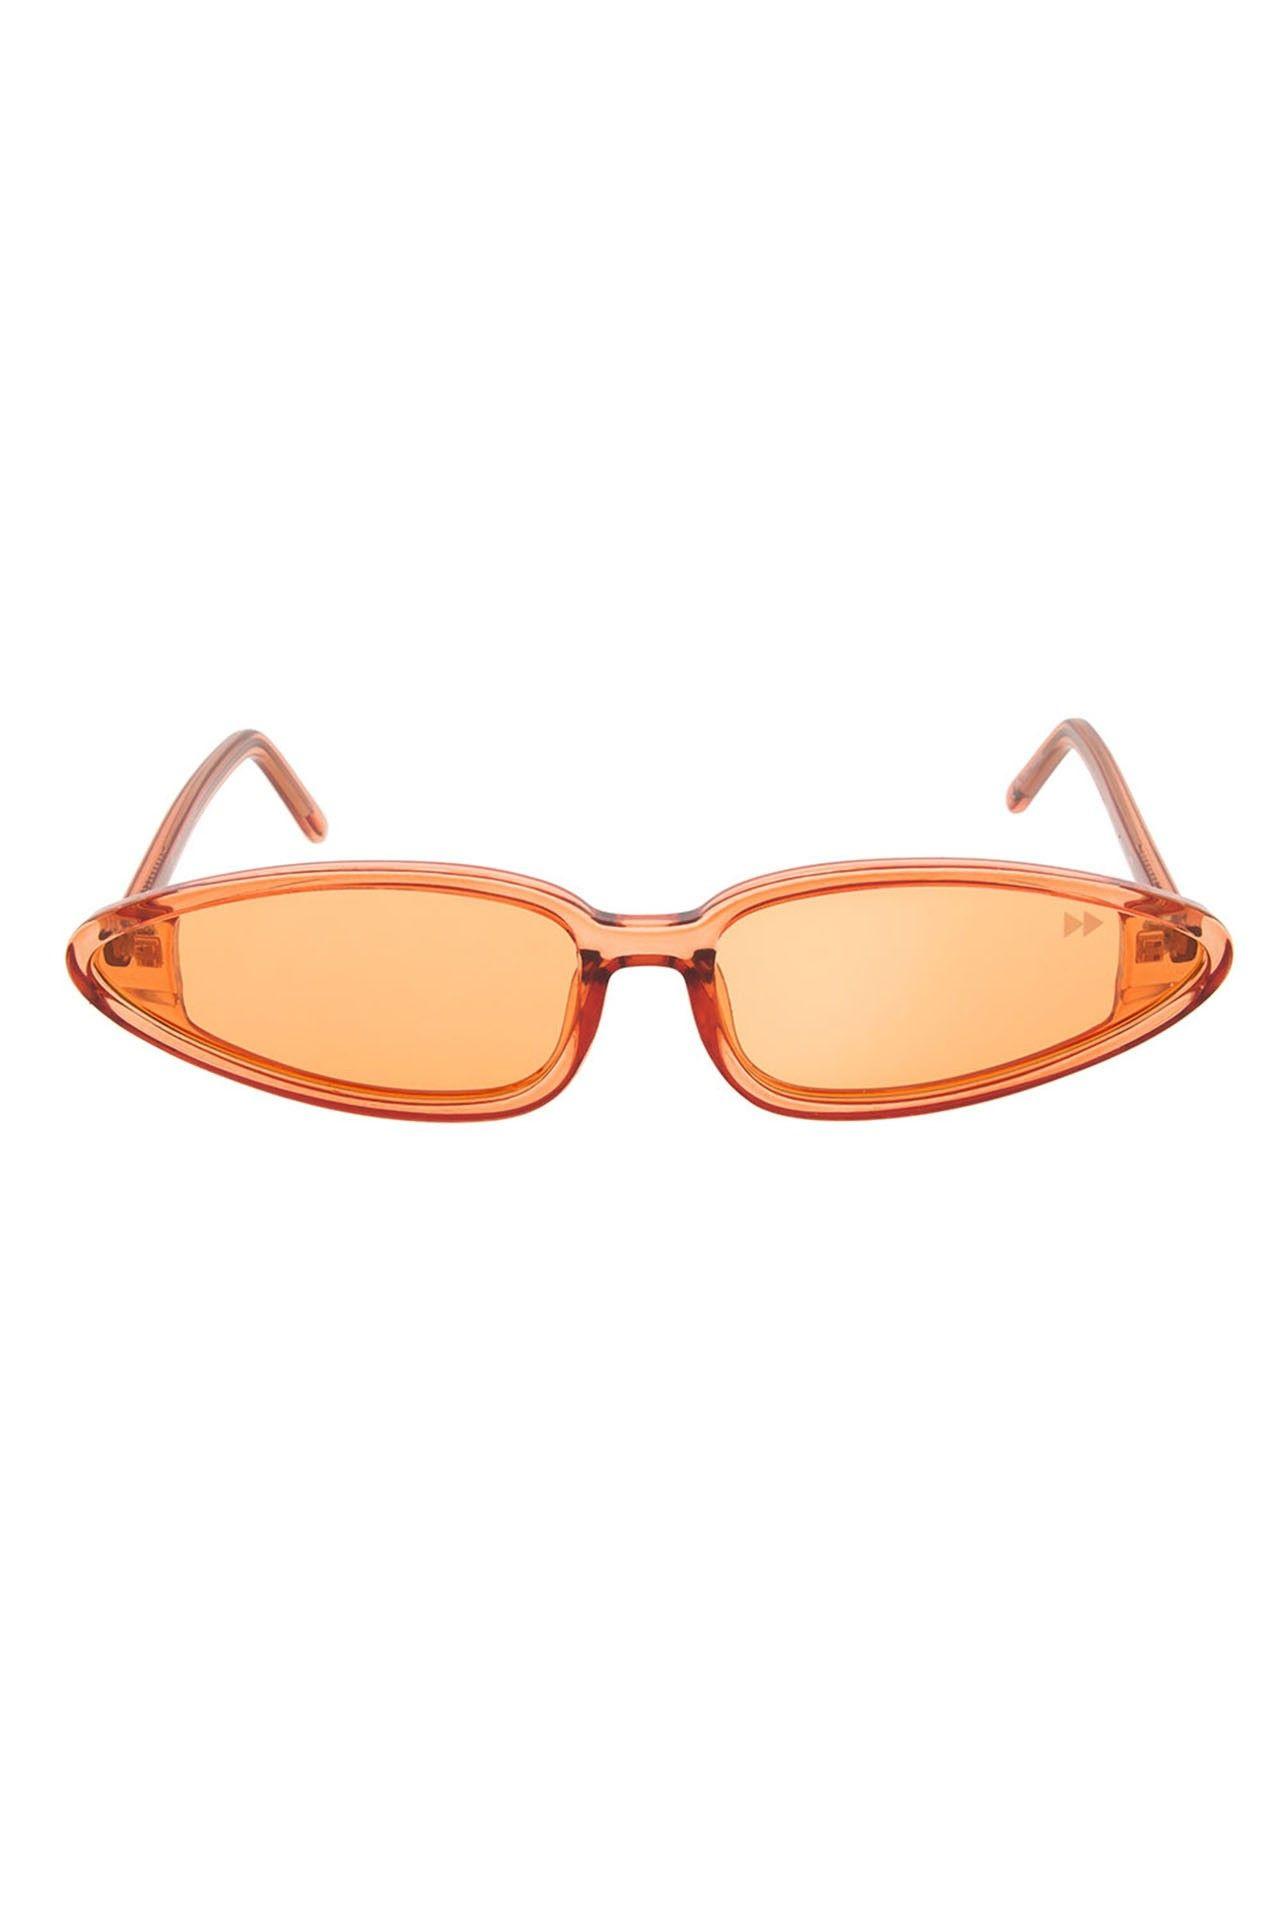 Afbeelding van Sunheroes Ima Premium 6230 Zonnebril Clear Red